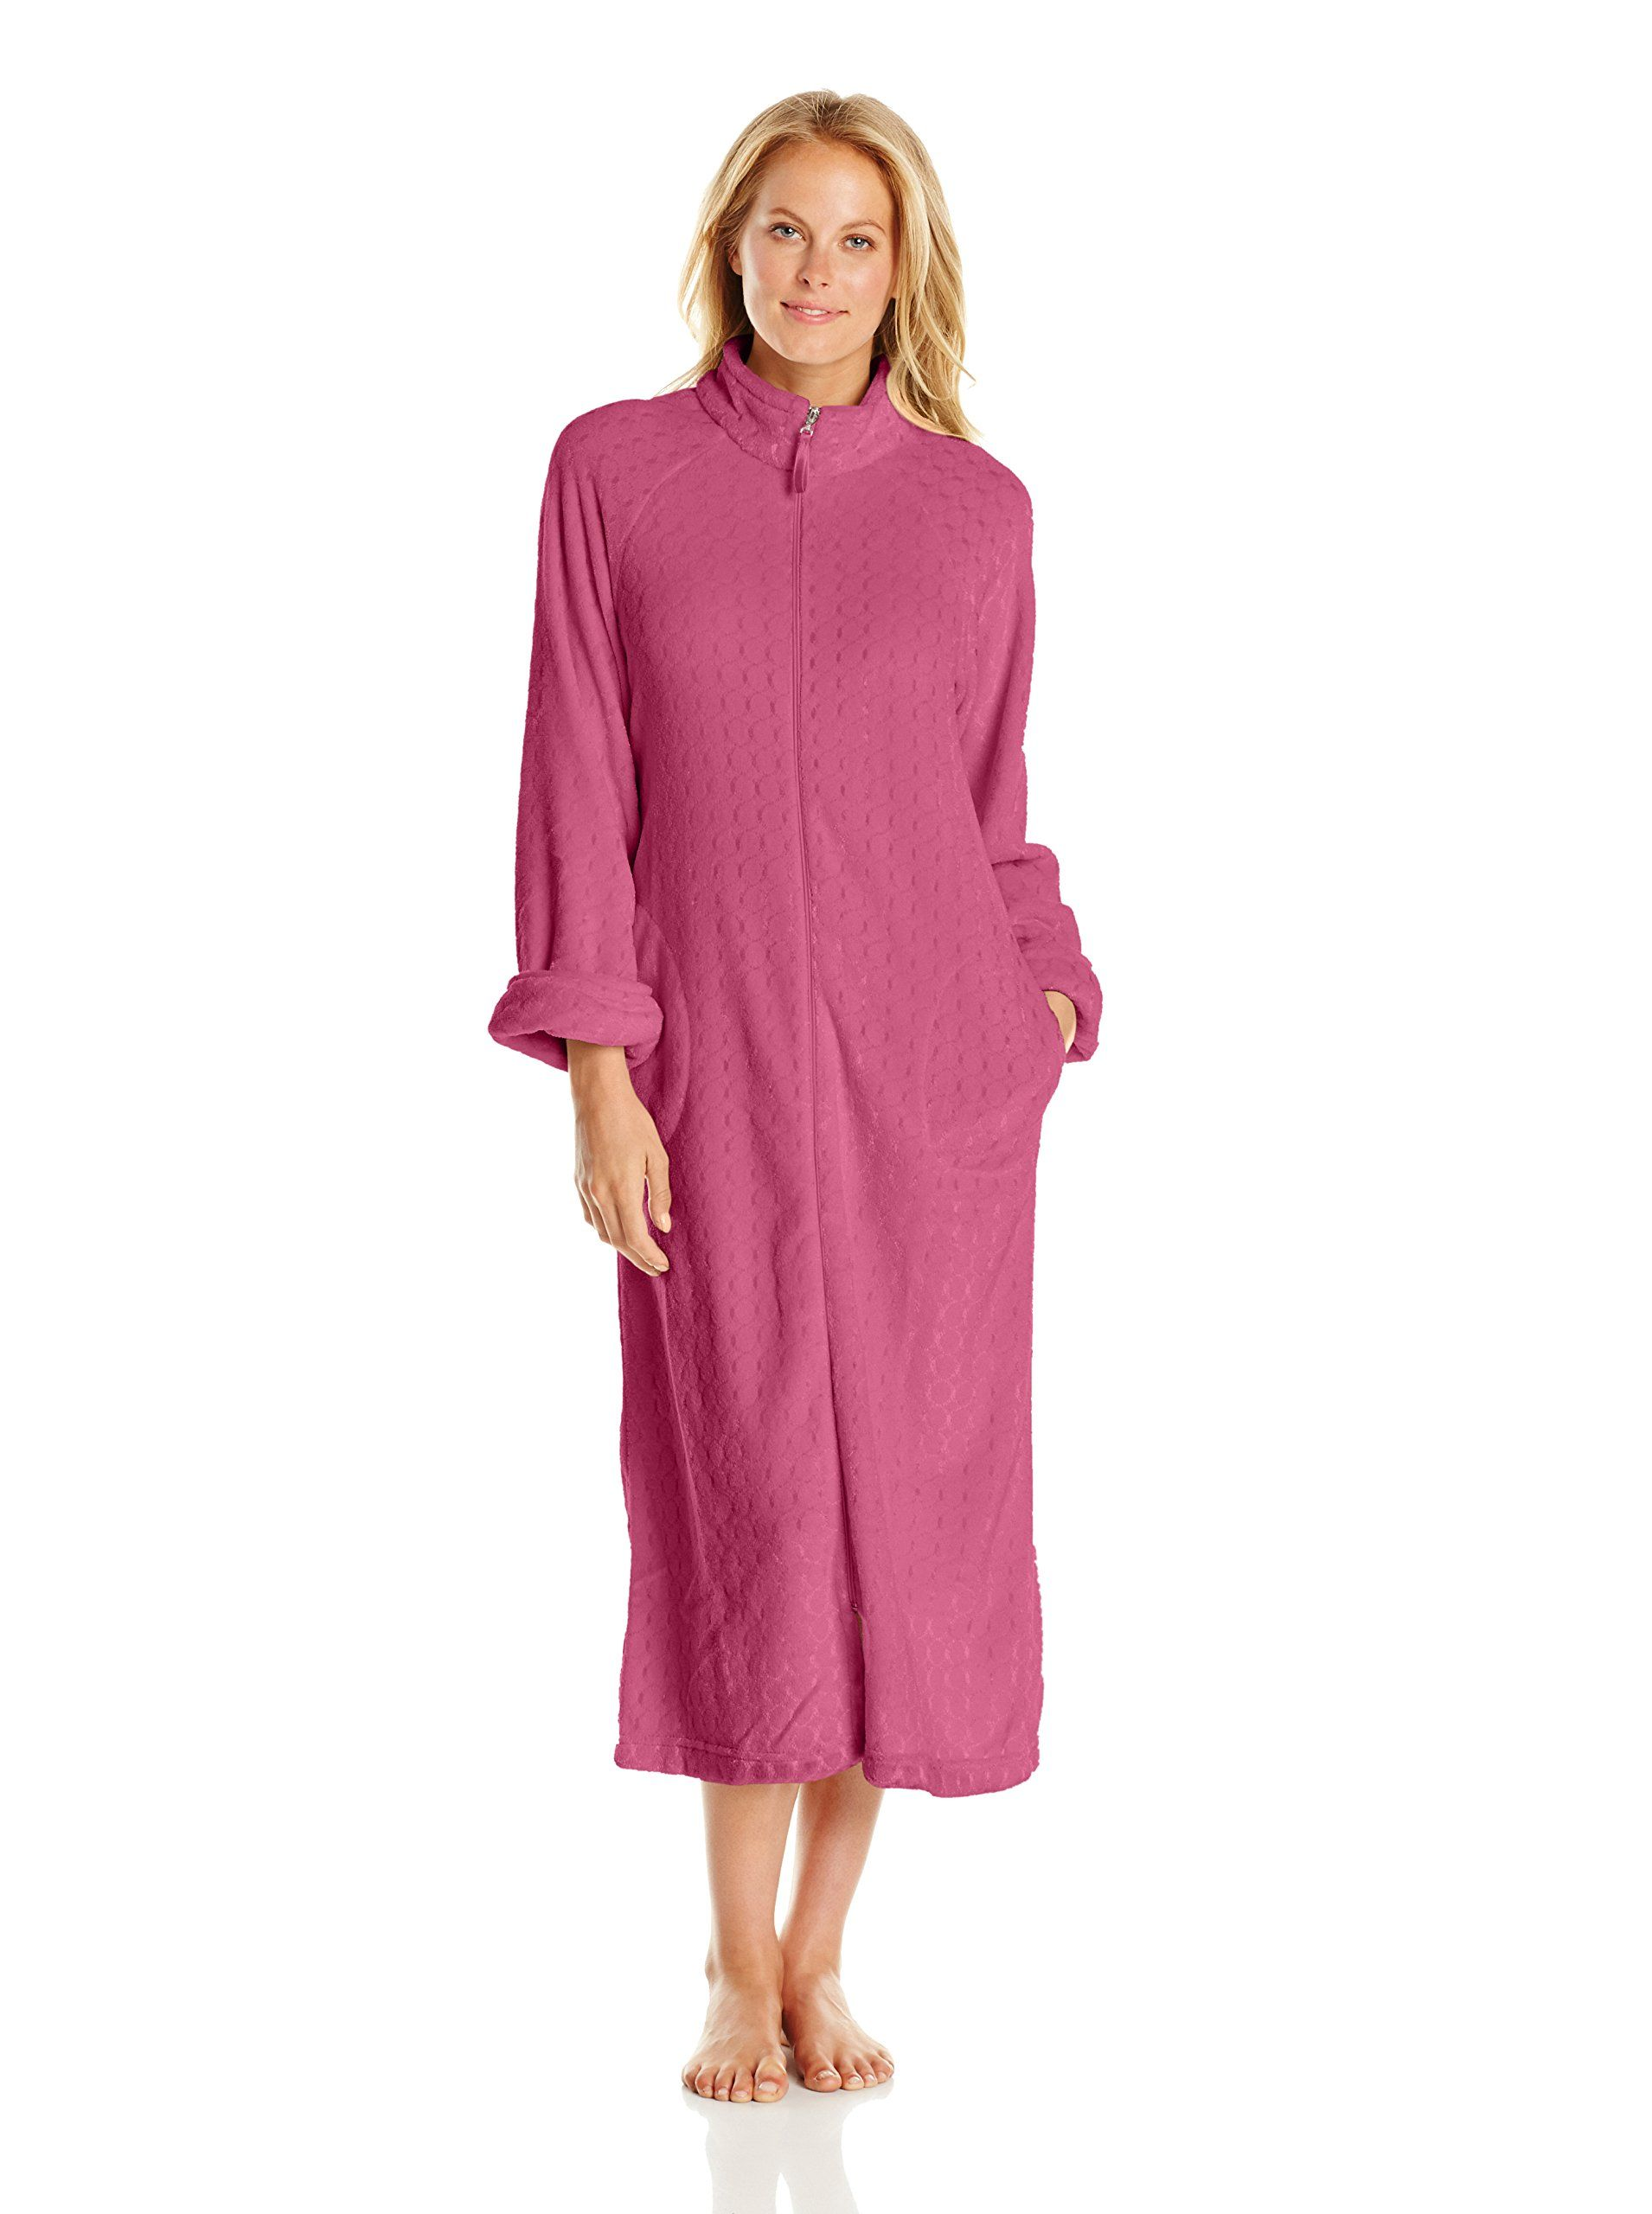 Textured Fleece Zip-Up Robe   Amazon